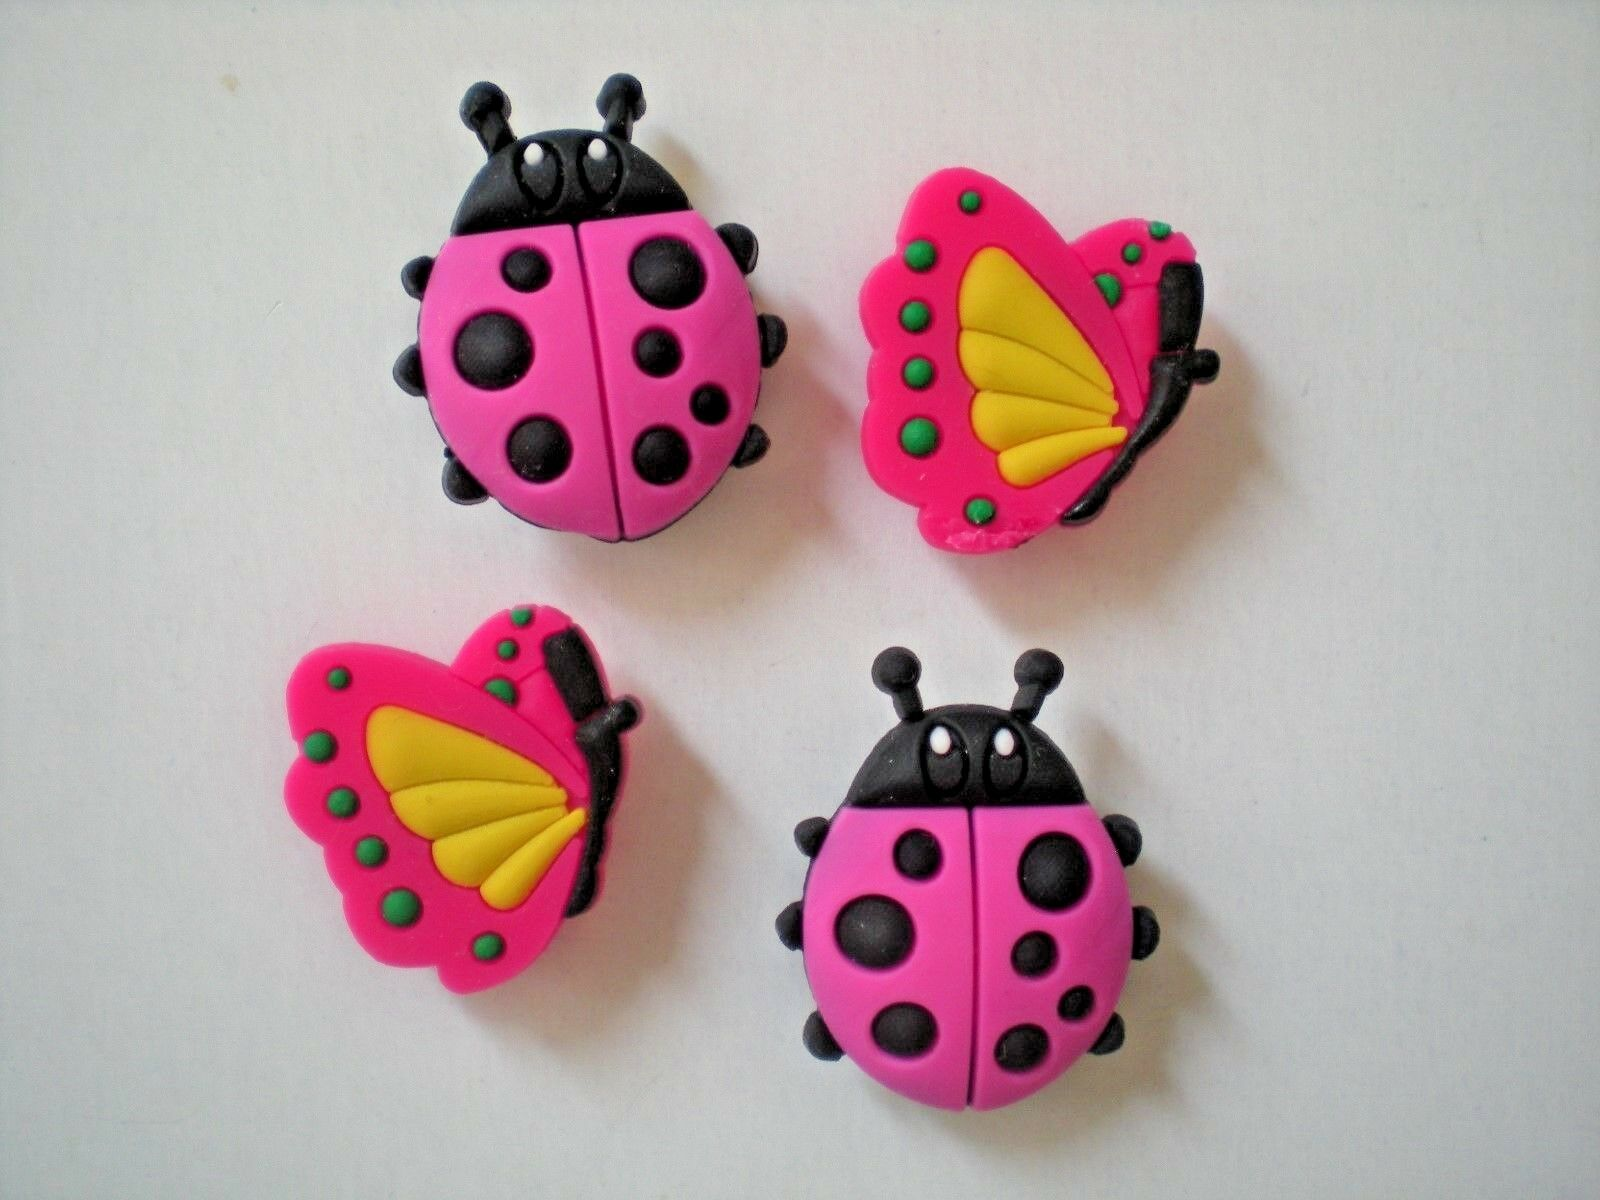 Clog Shoe Charms Button Plug Heart Accessories Bracelet WristBand